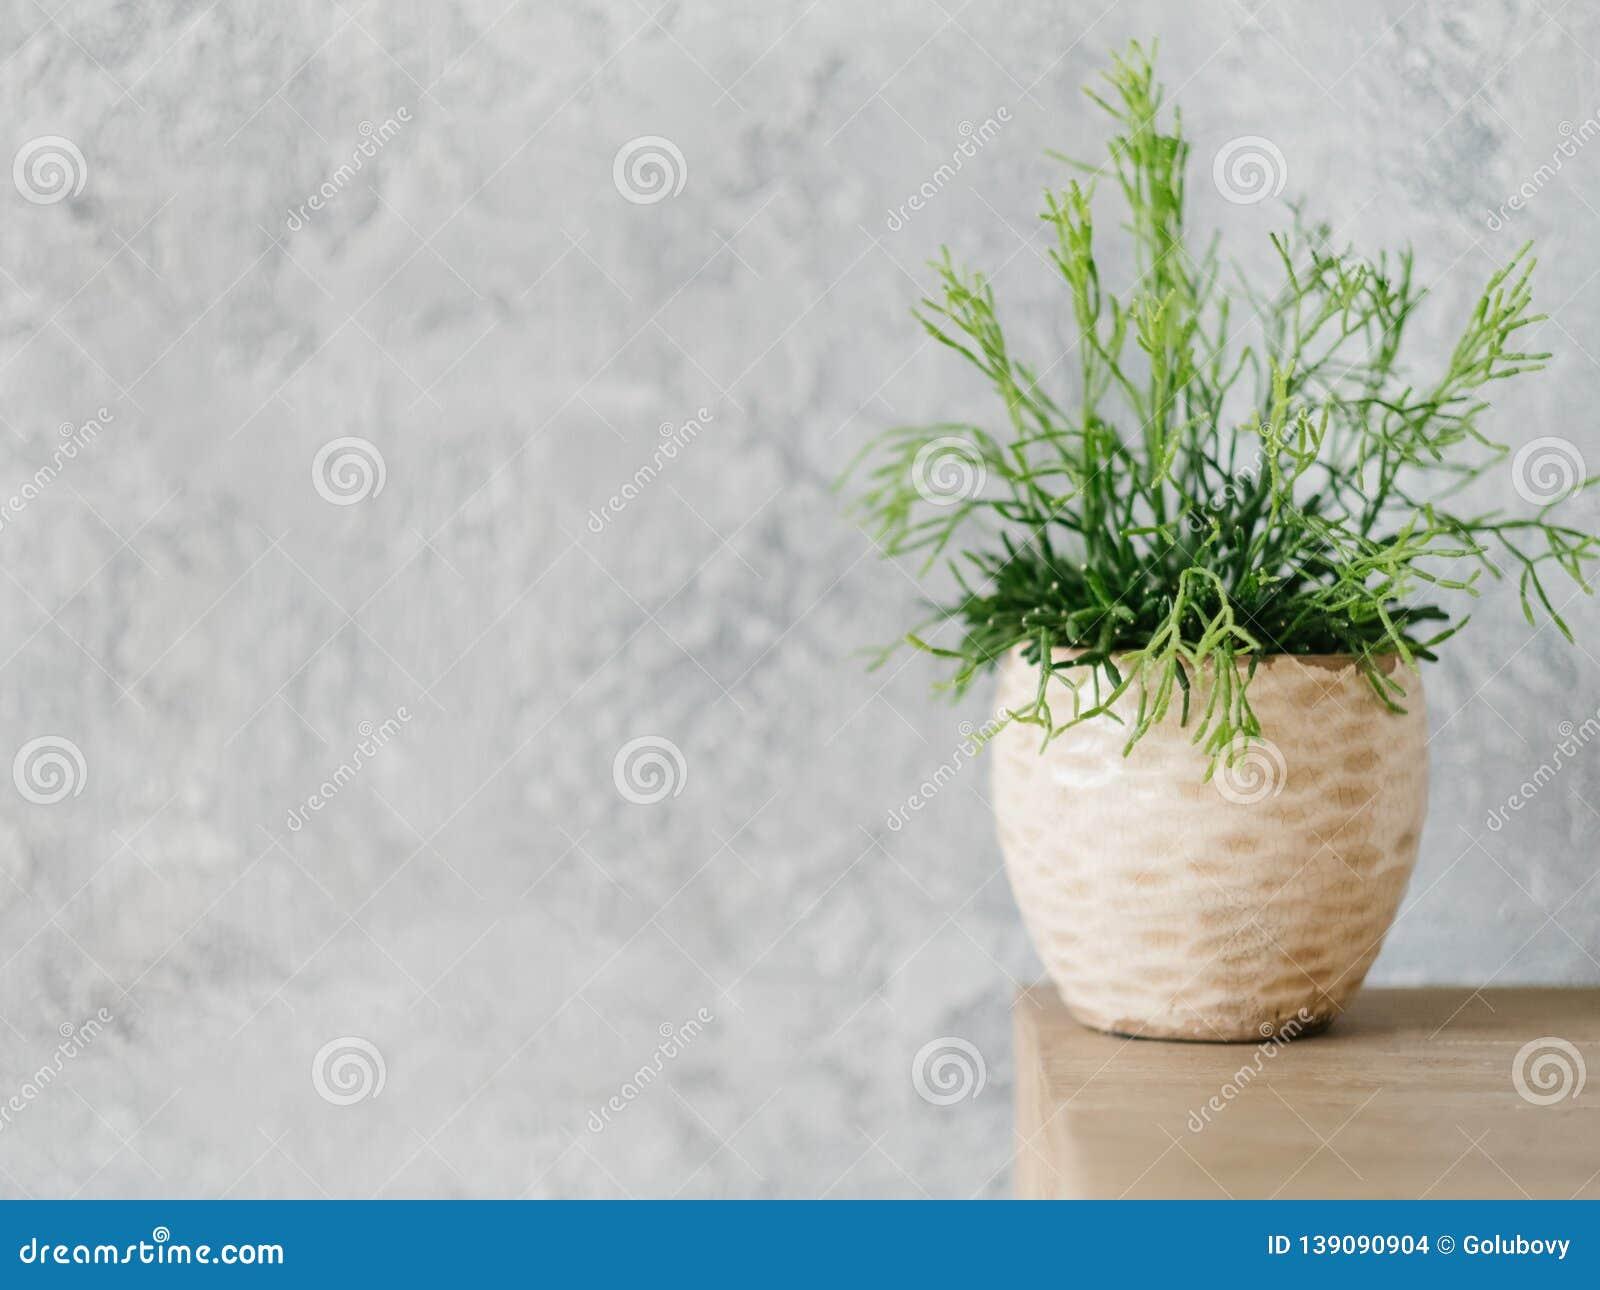 Home plant decor design flowerpot houseplant